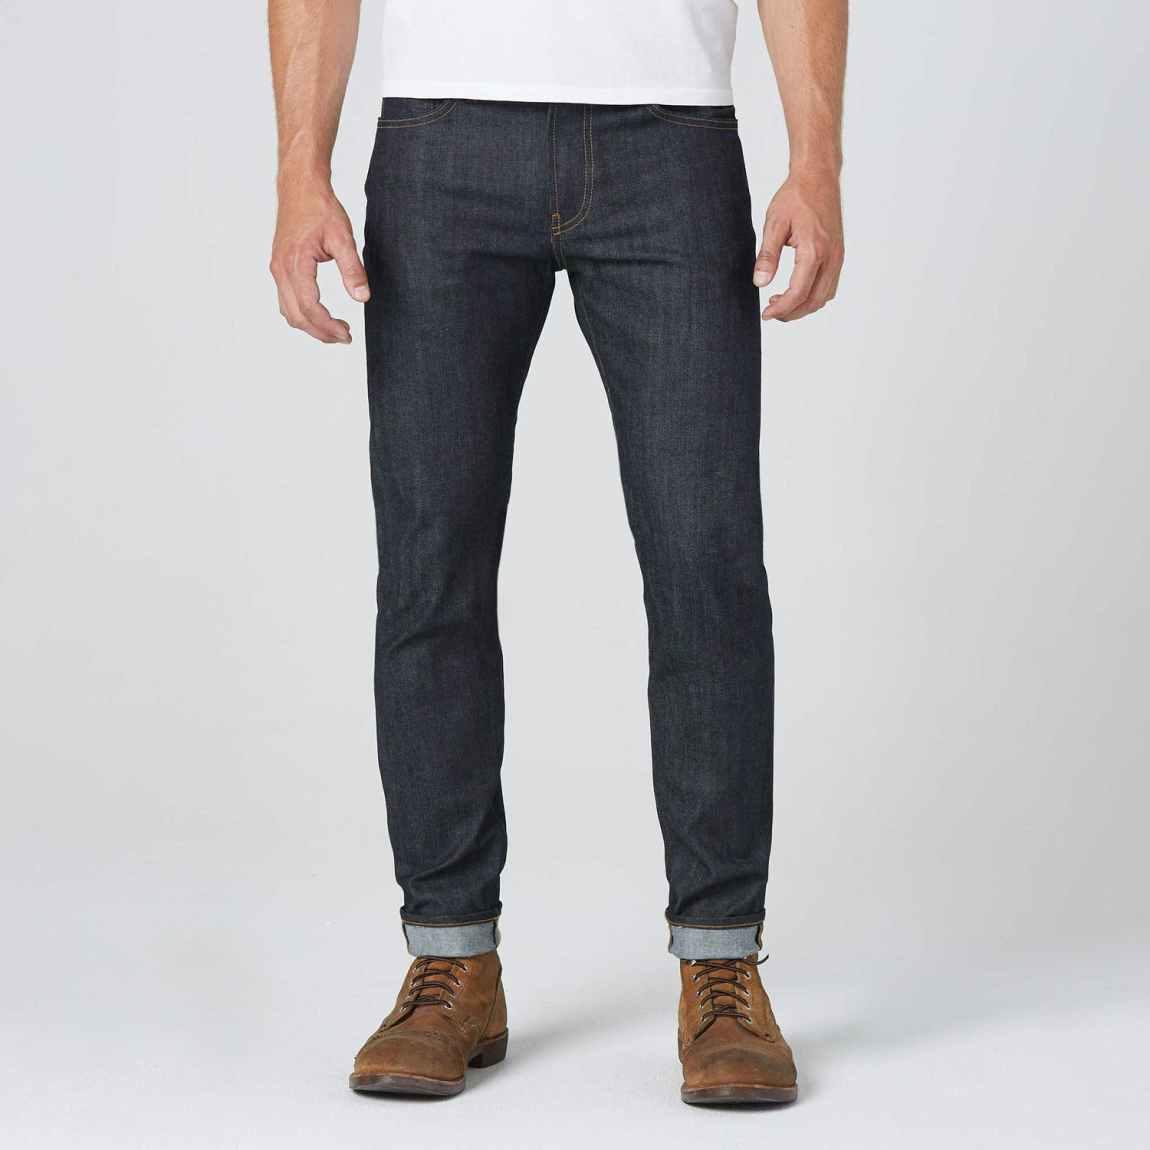 dstld, dstld jeans, raw denim, raw jeans, 24 dip, sanfornized denim, blue jeans, skinny slim jeans